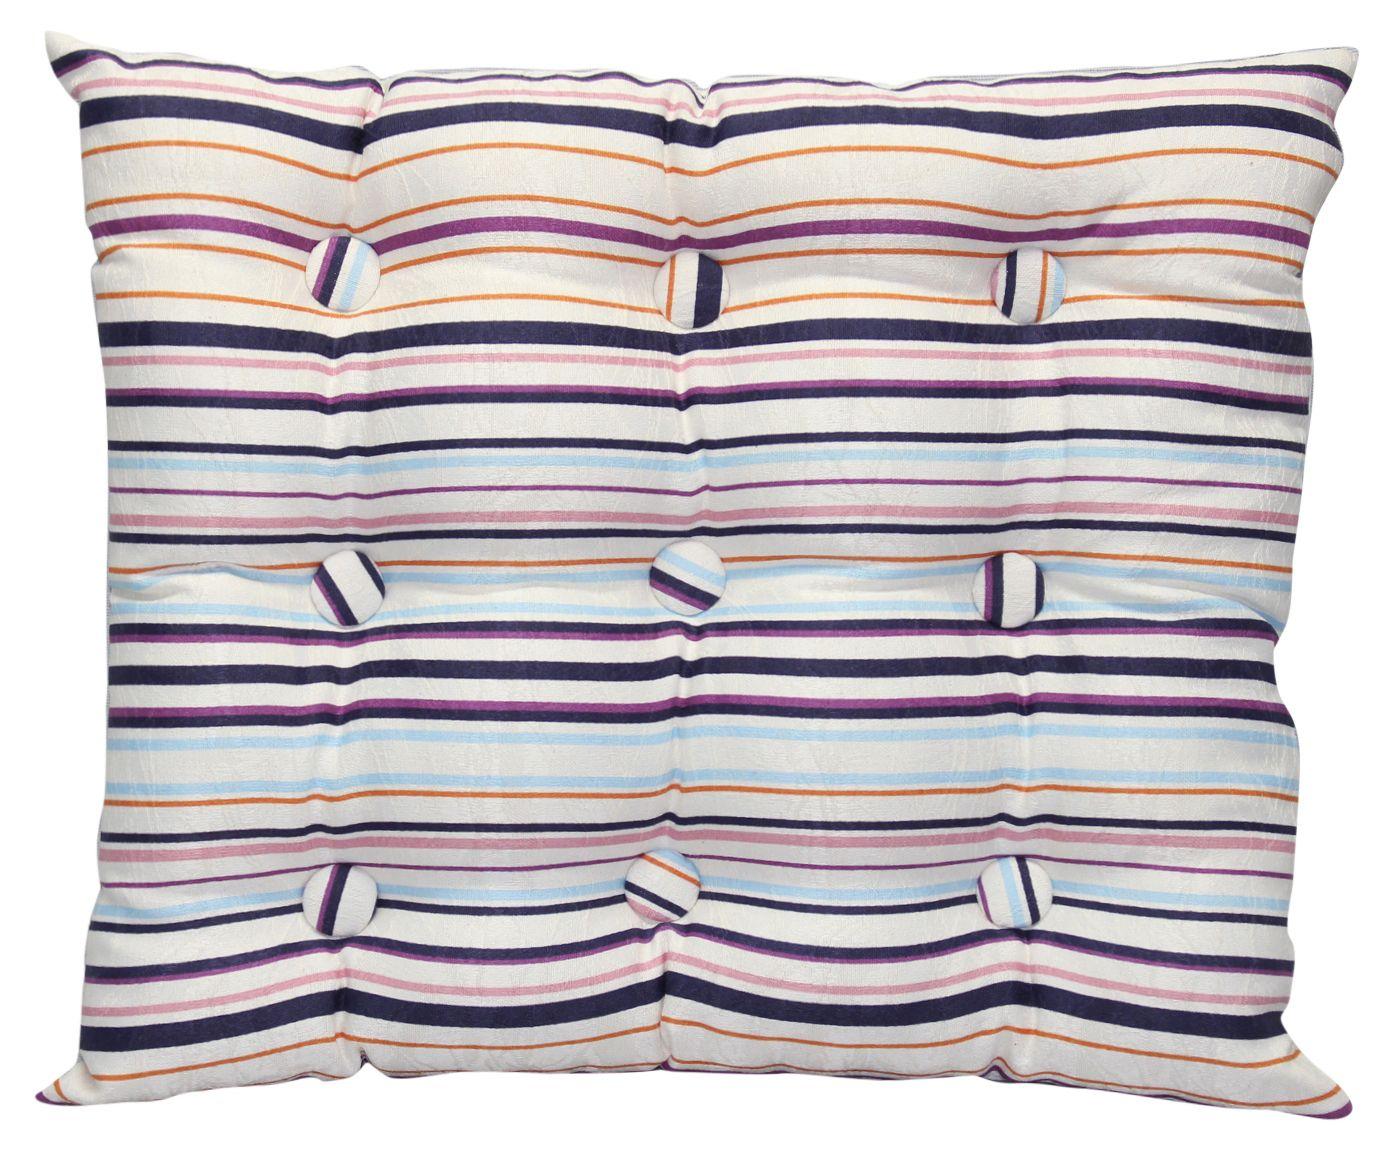 Almofada Zabuton Marble Striped Bege - 40x50cm | Westwing.com.br